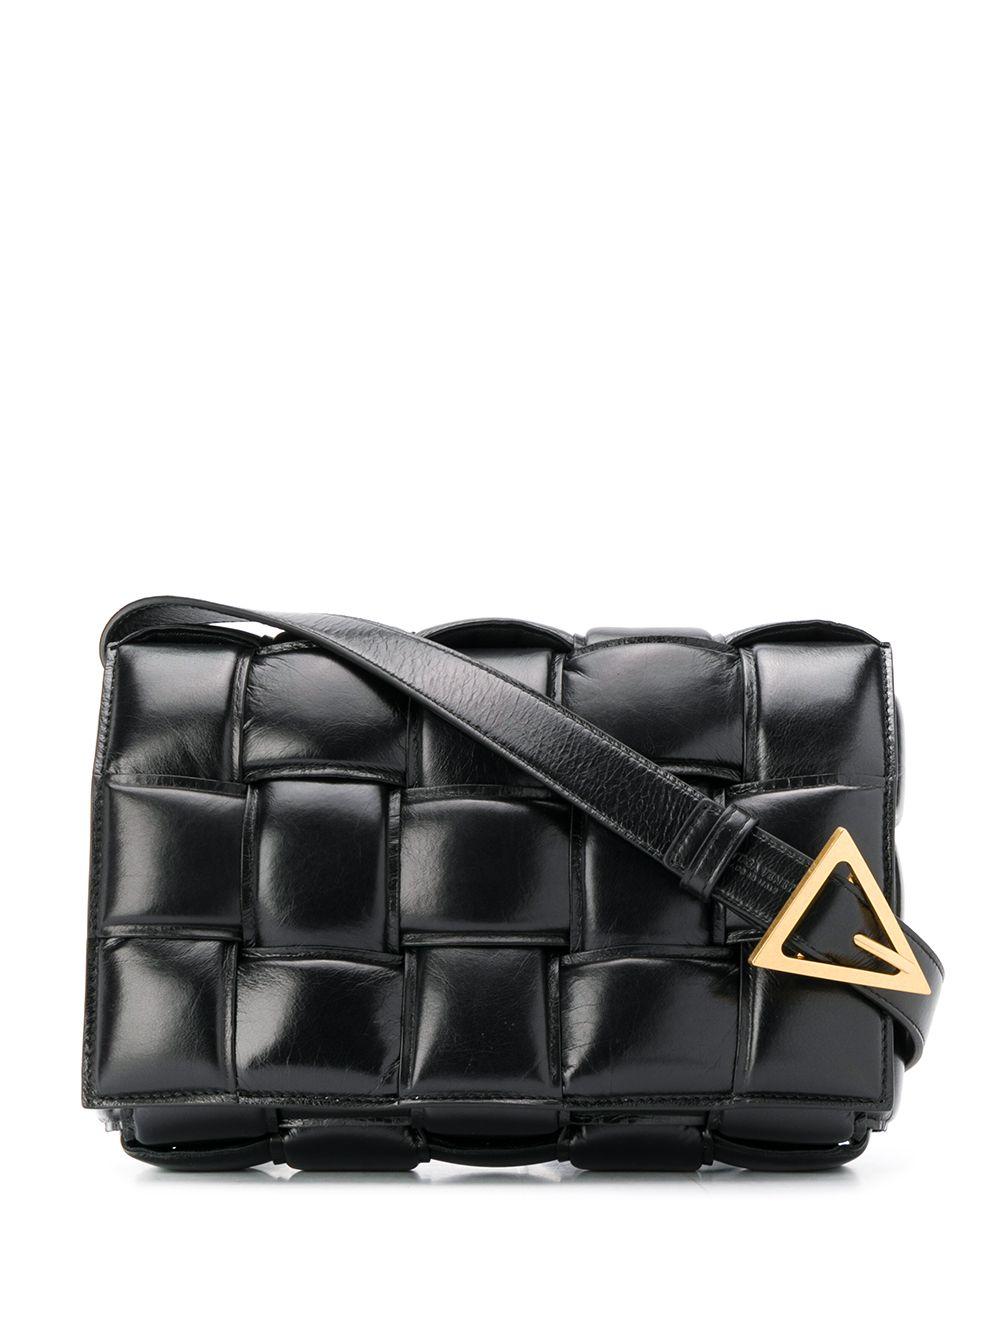 Padded Cassette Bag by Bottega Veneta, available on farfetch.com Hailey Baldwin Bags Exact Product